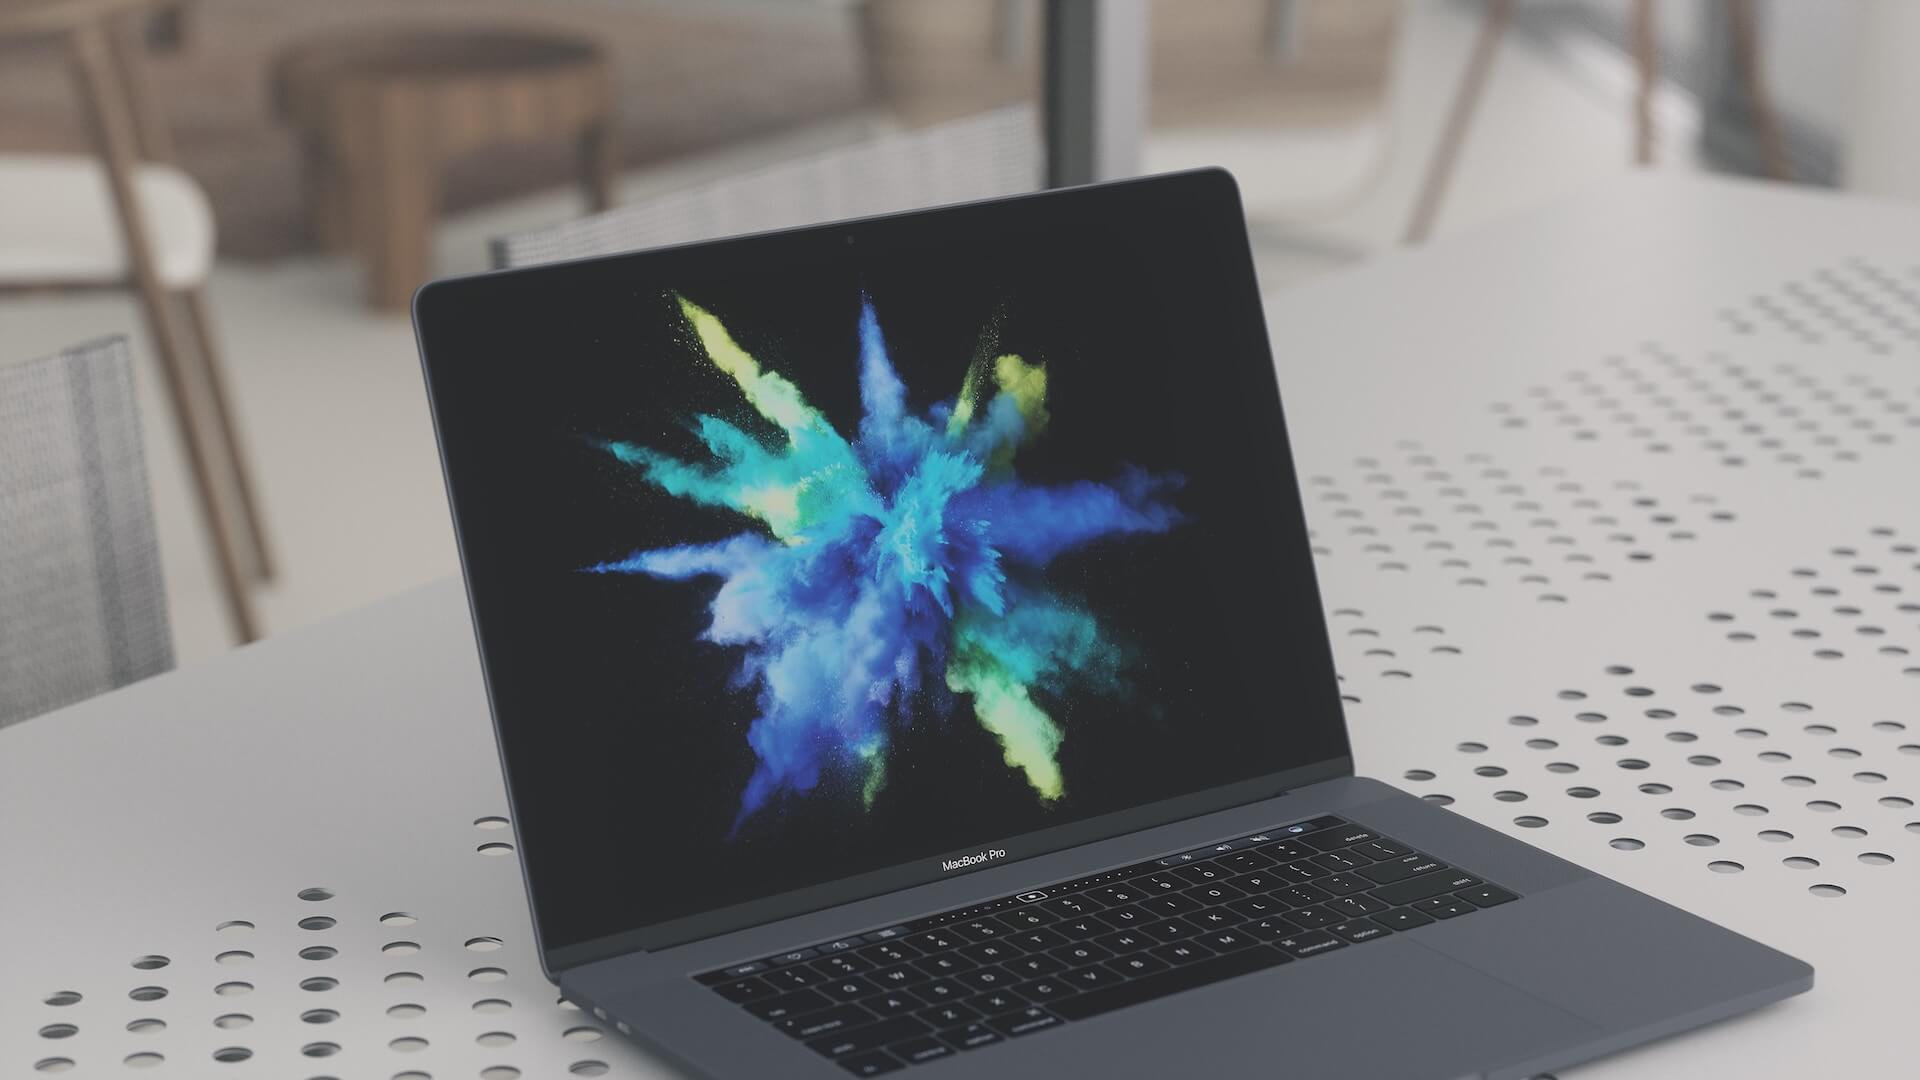 Apple今年10月中に新製品発表イベント開催?16インチのMacBook Proが発表か tech191002_macbookpro_1